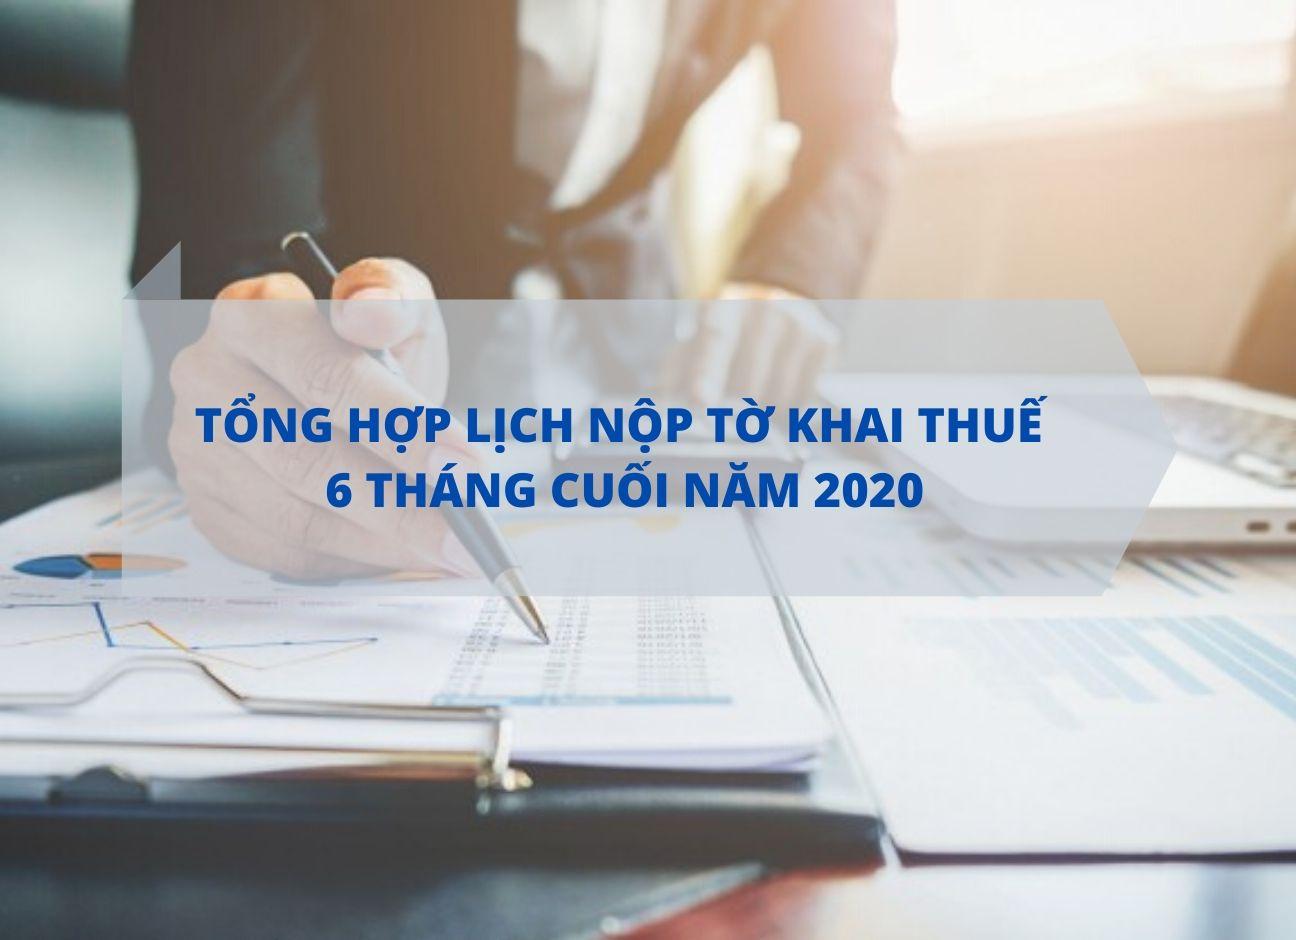 nop to khai thue